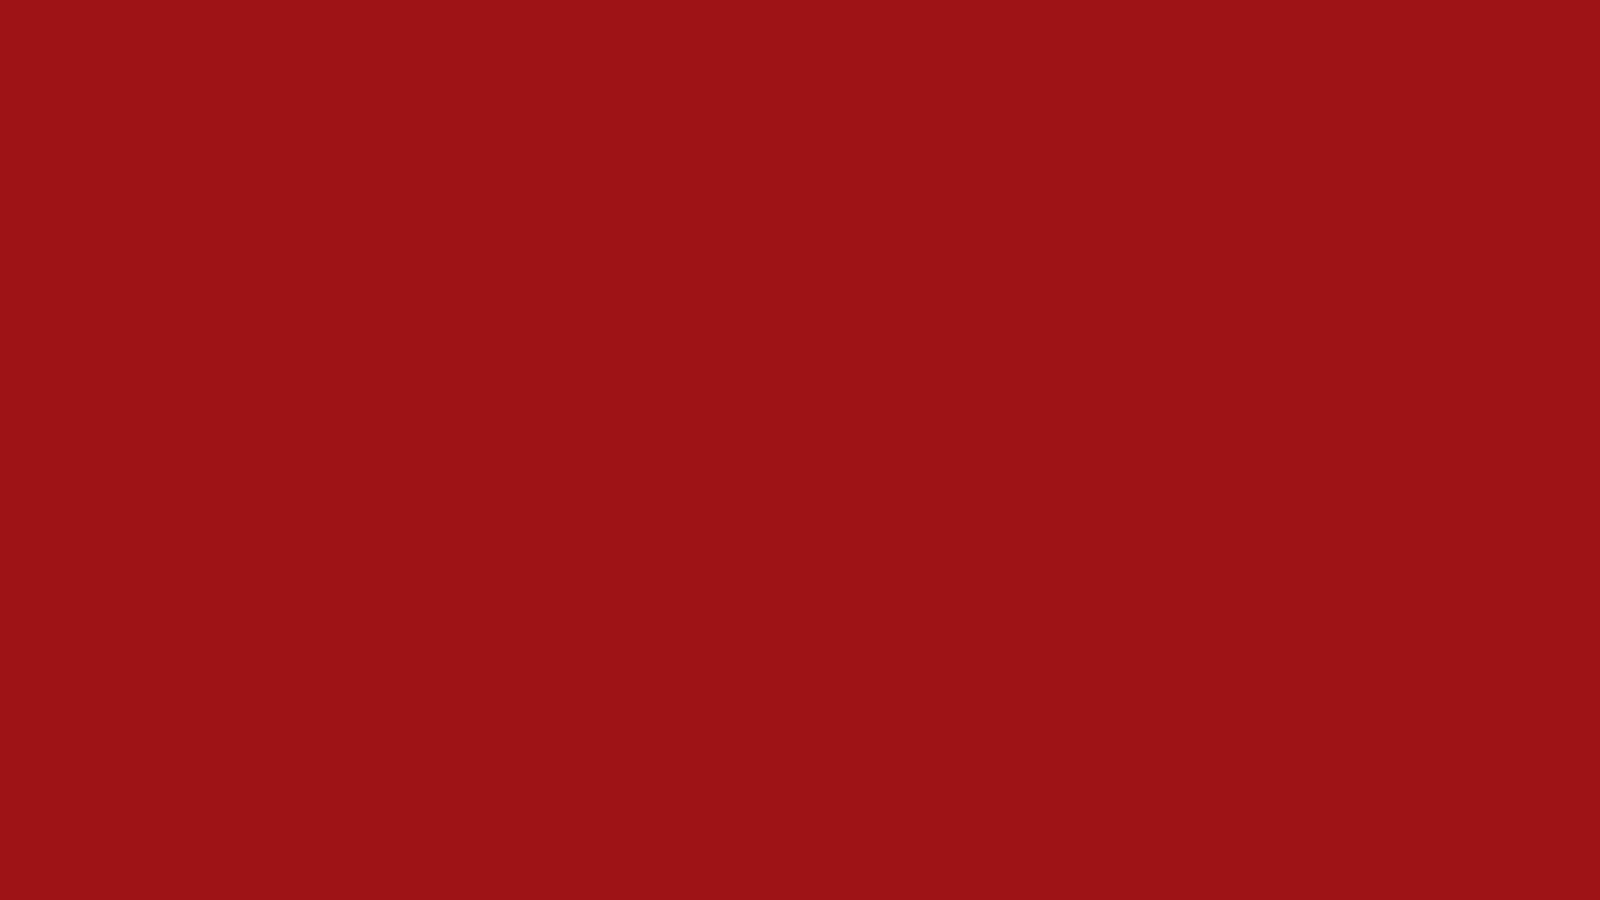 1600x900 Spartan Crimson Solid Color Background